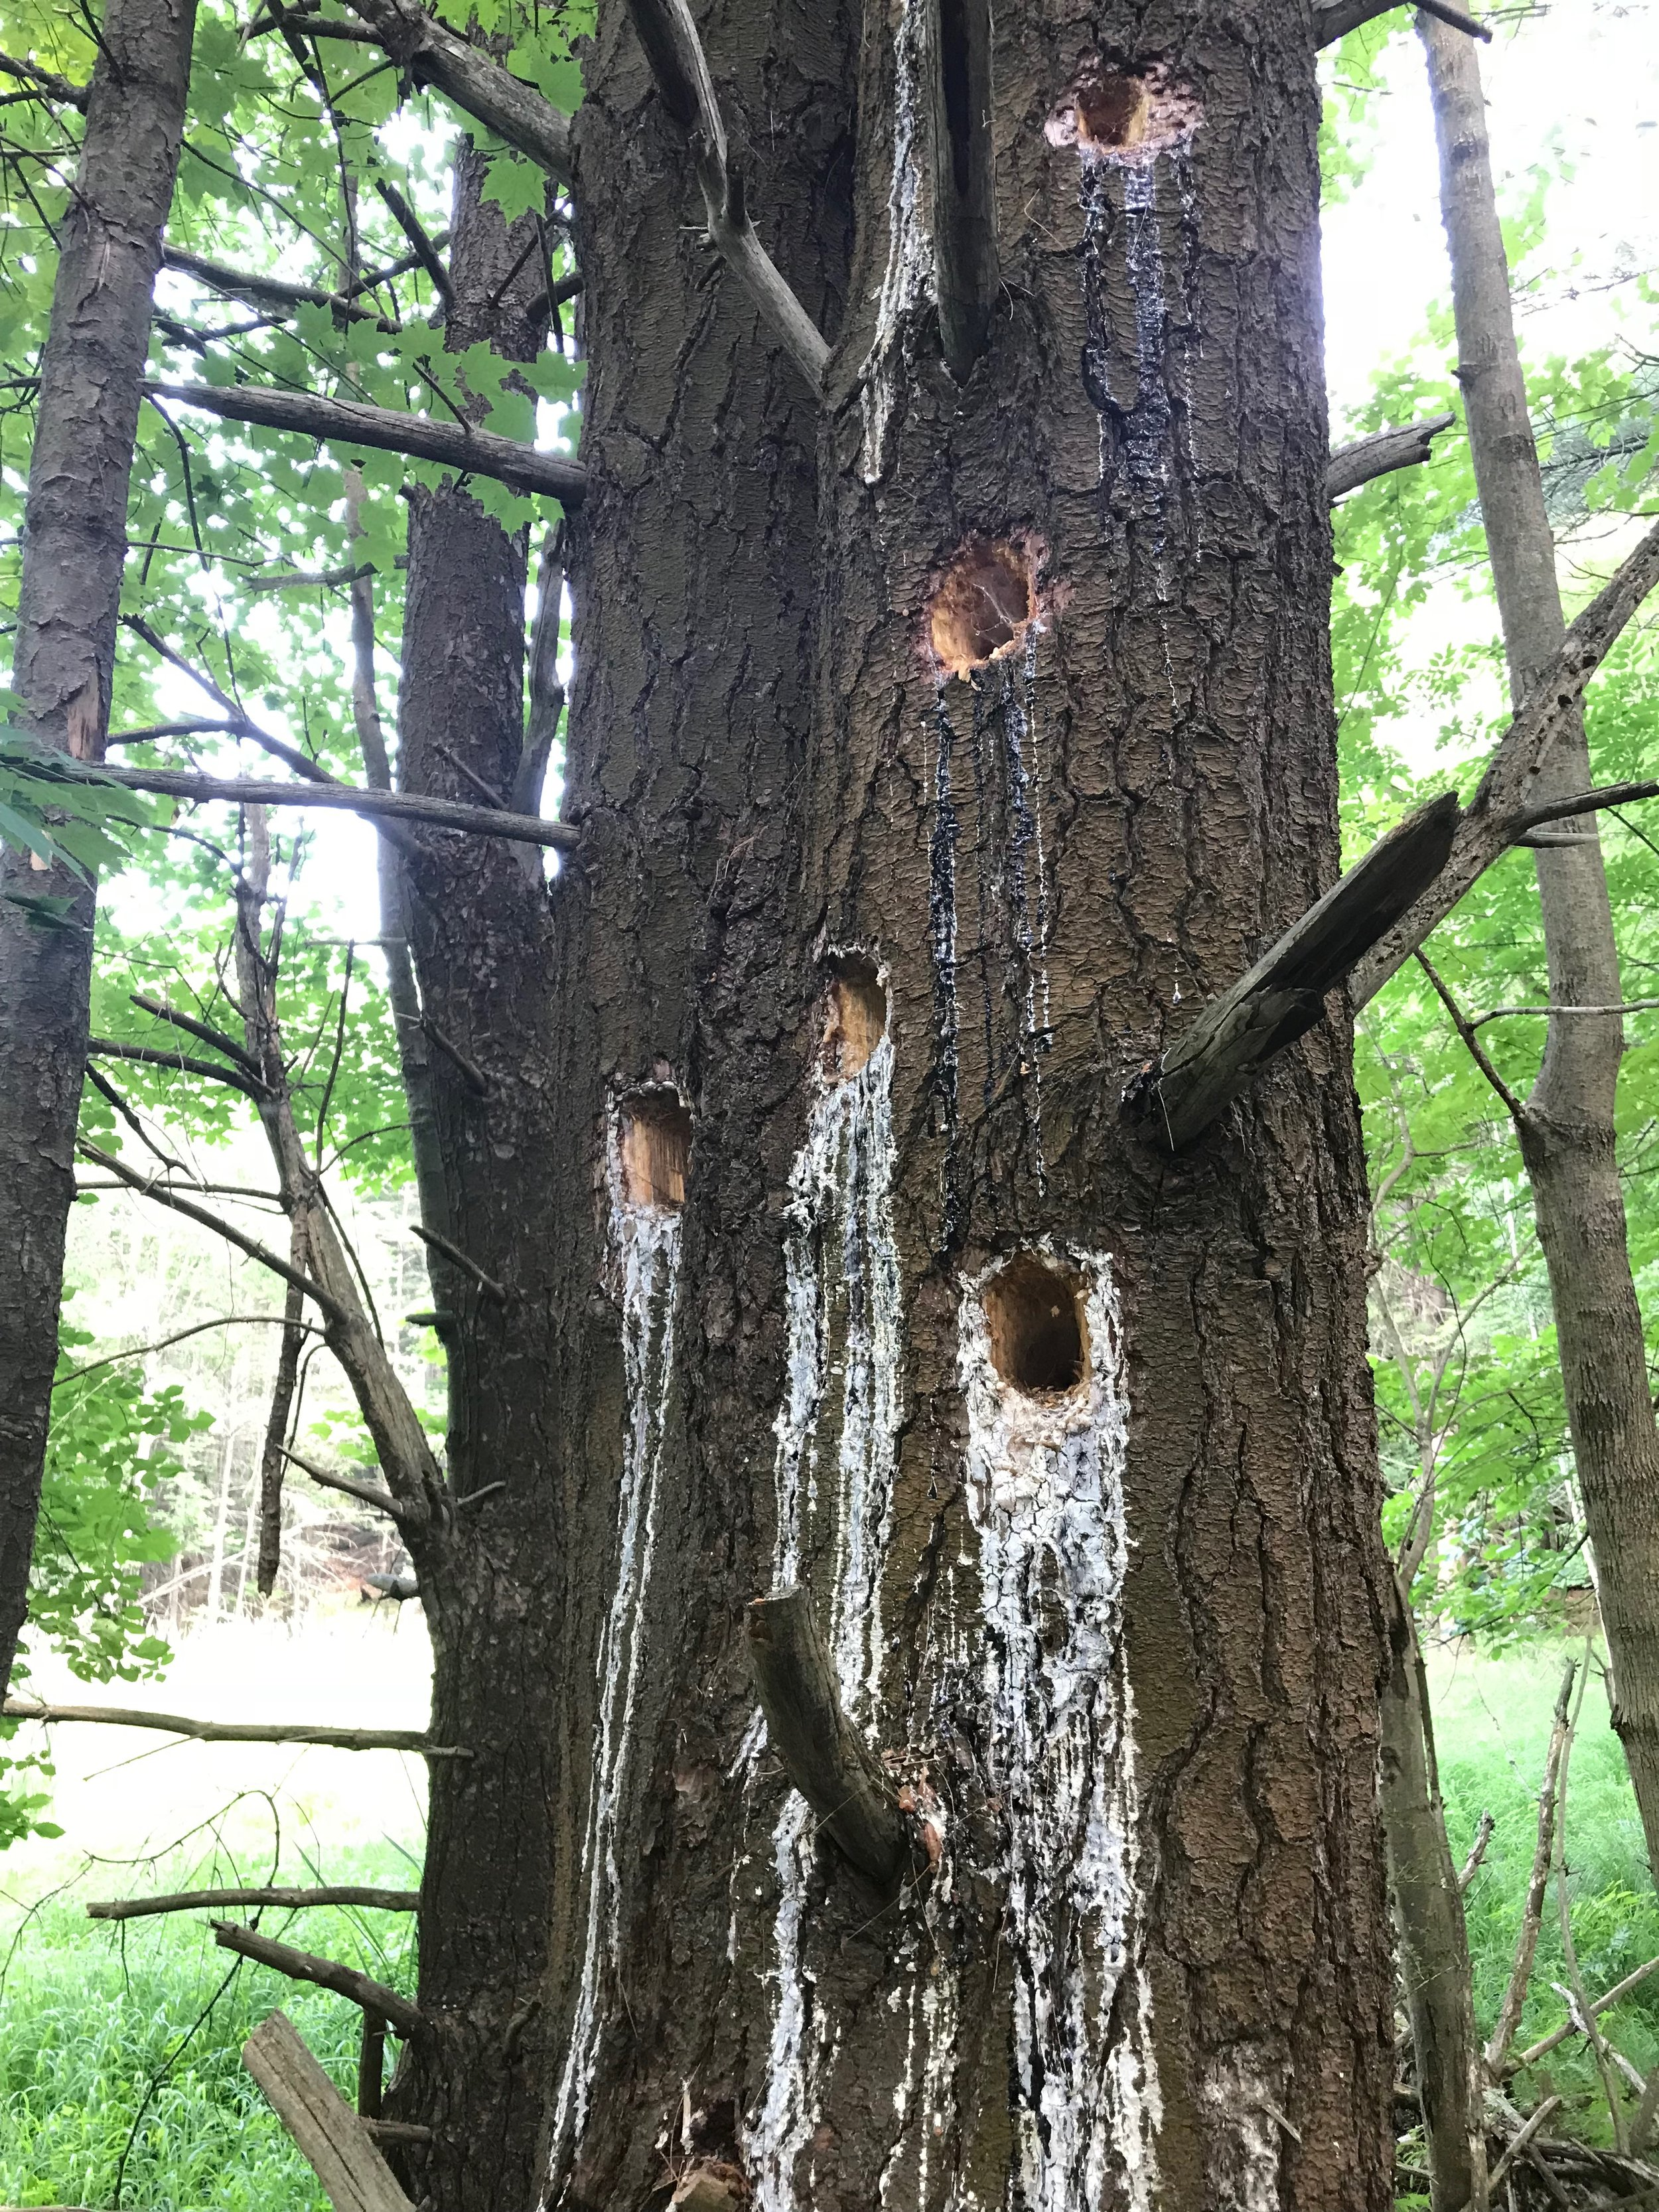 Fresh woodpecker wounds.